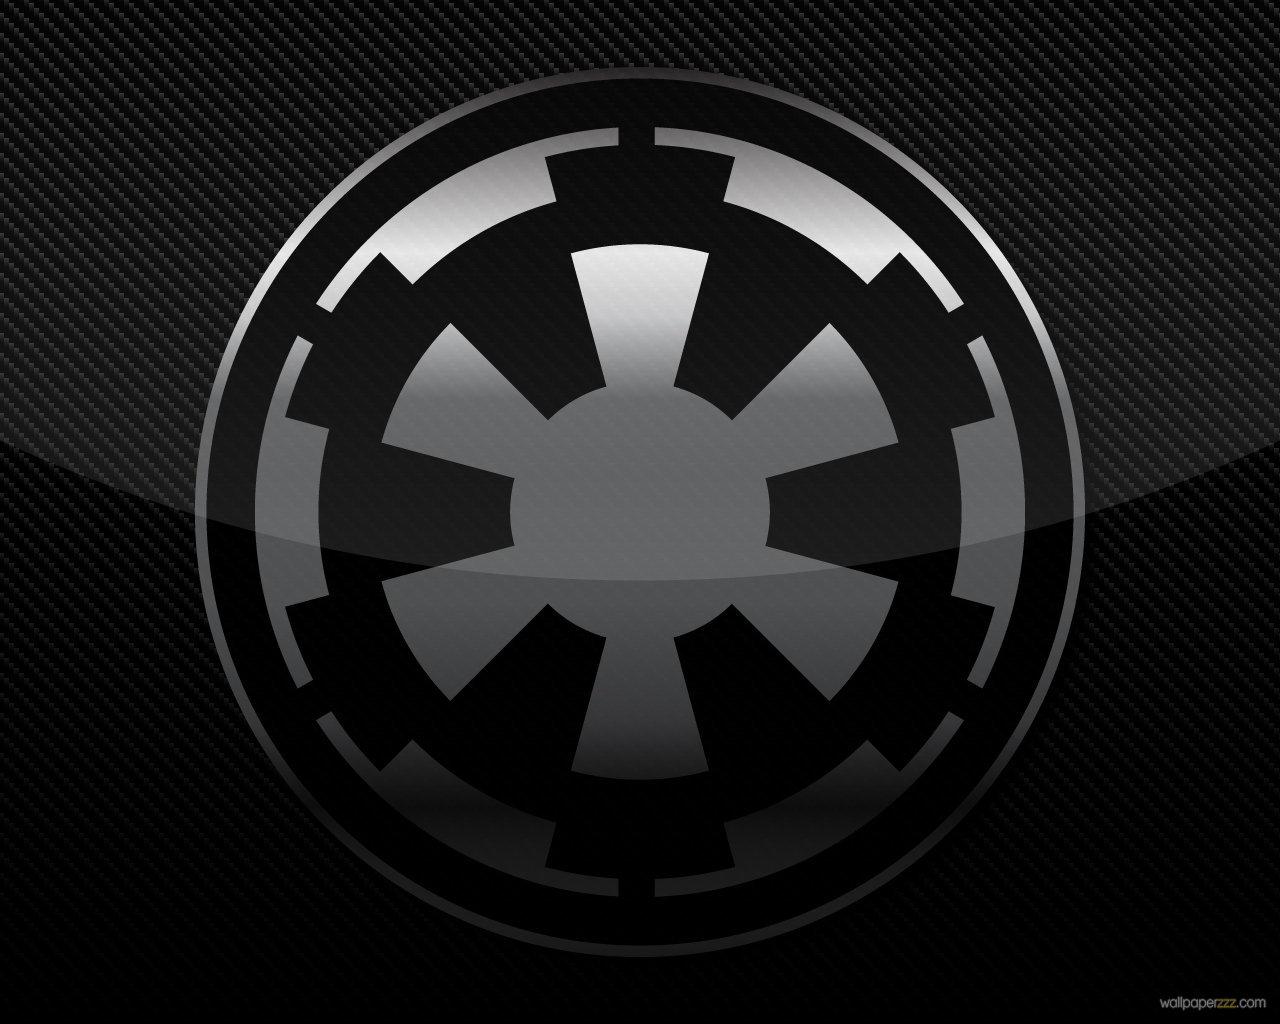 High Resolution Wallpaper | Star Wars: Empire 1280x1024 px